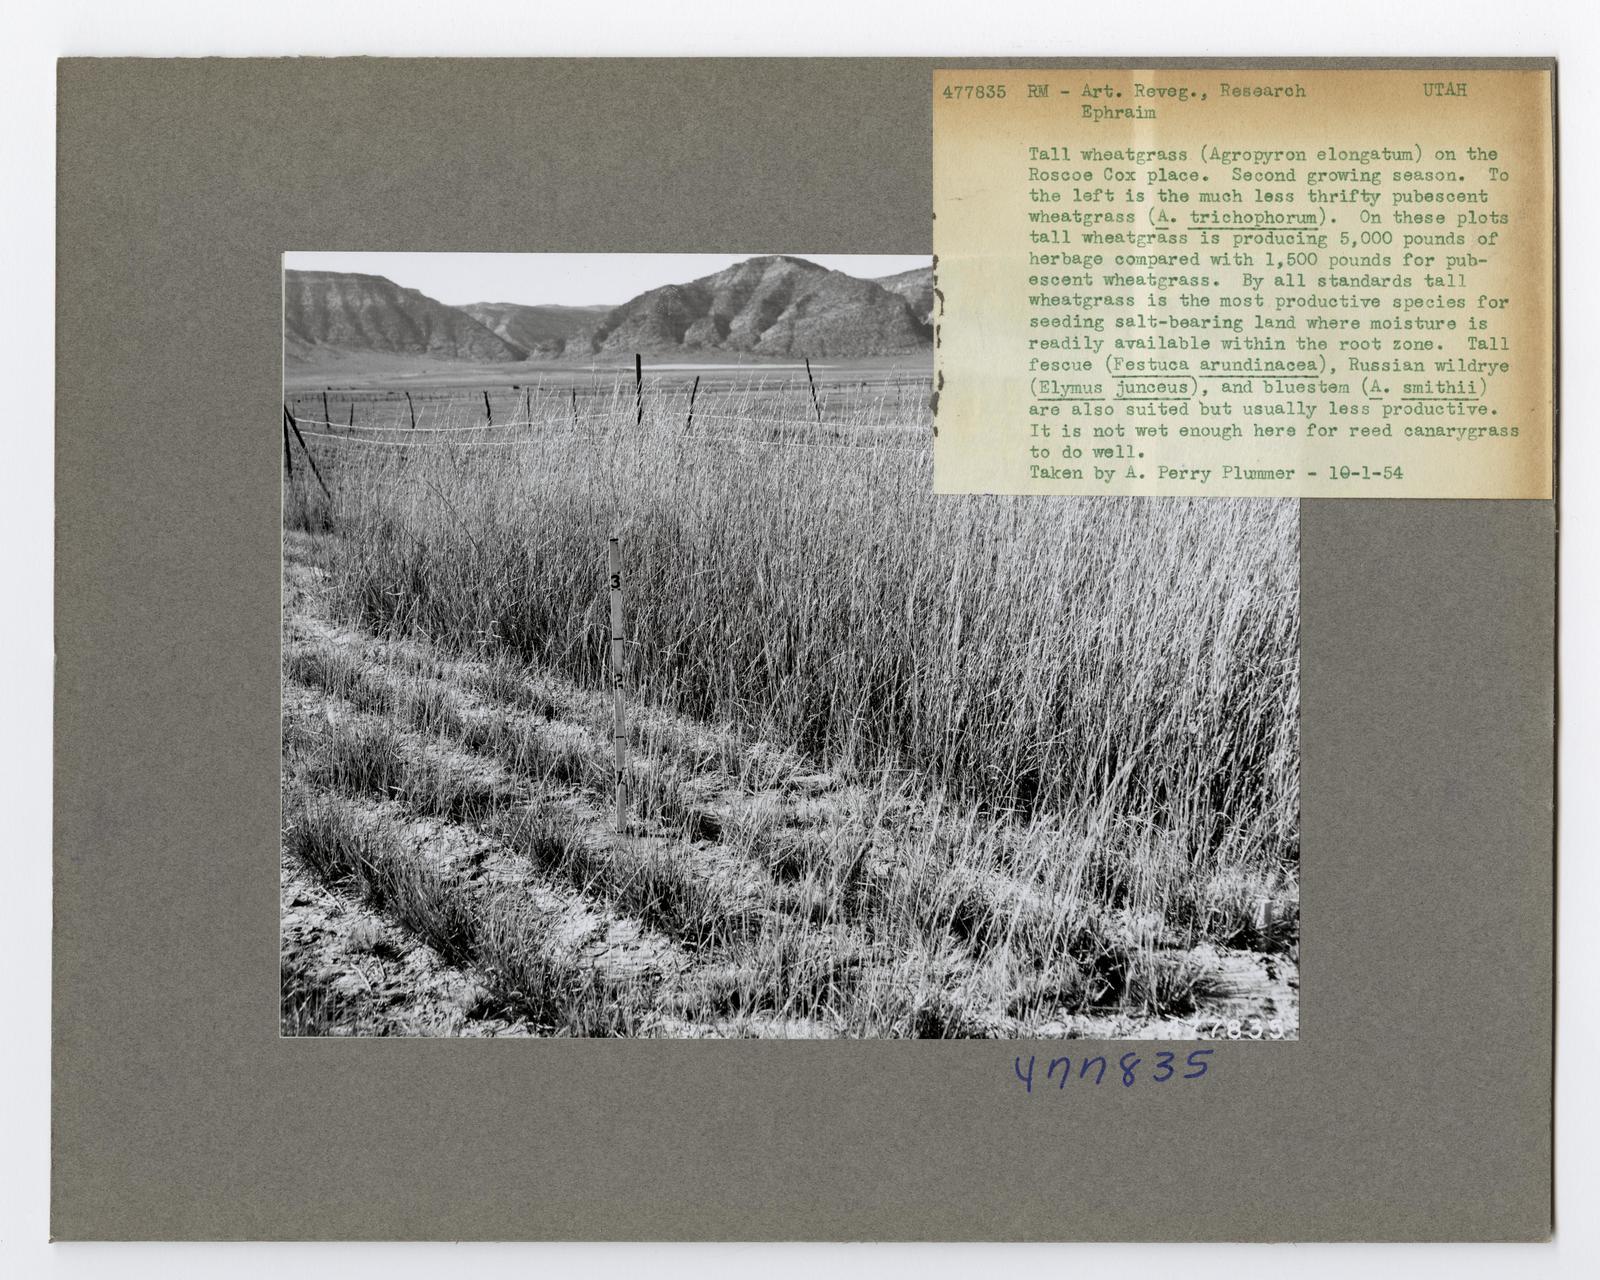 Range Management Research - Wyoming